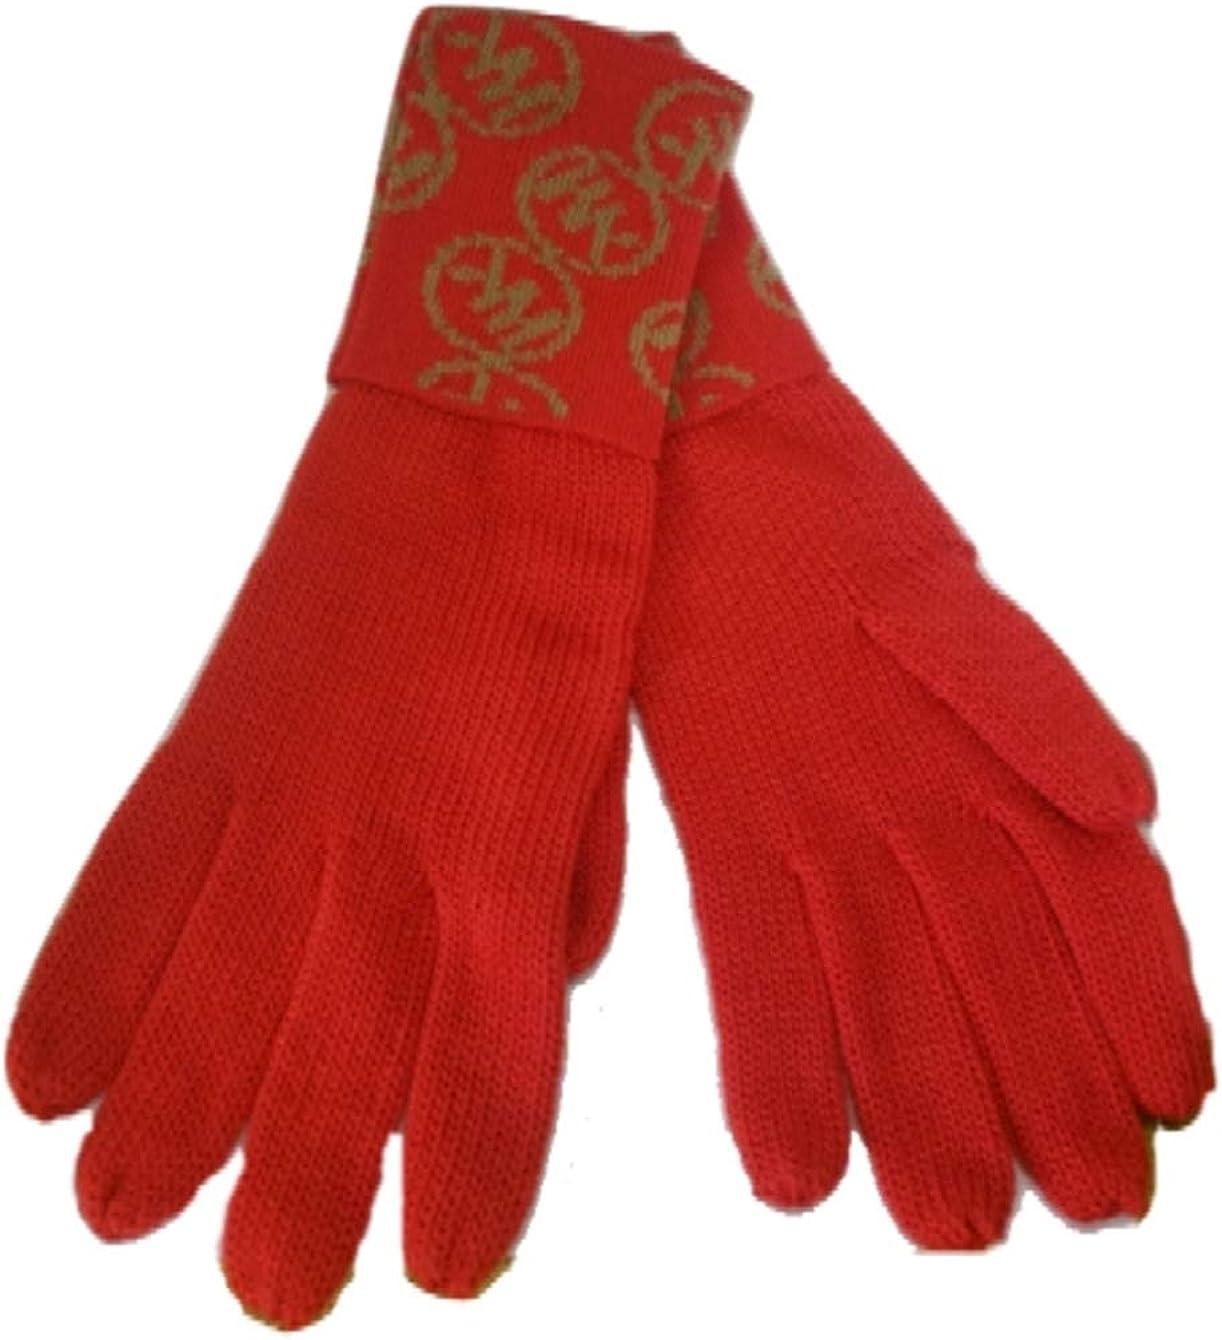 Michael Kors Circle Logo Knit Cuff Gloves, Tangerine/Camel